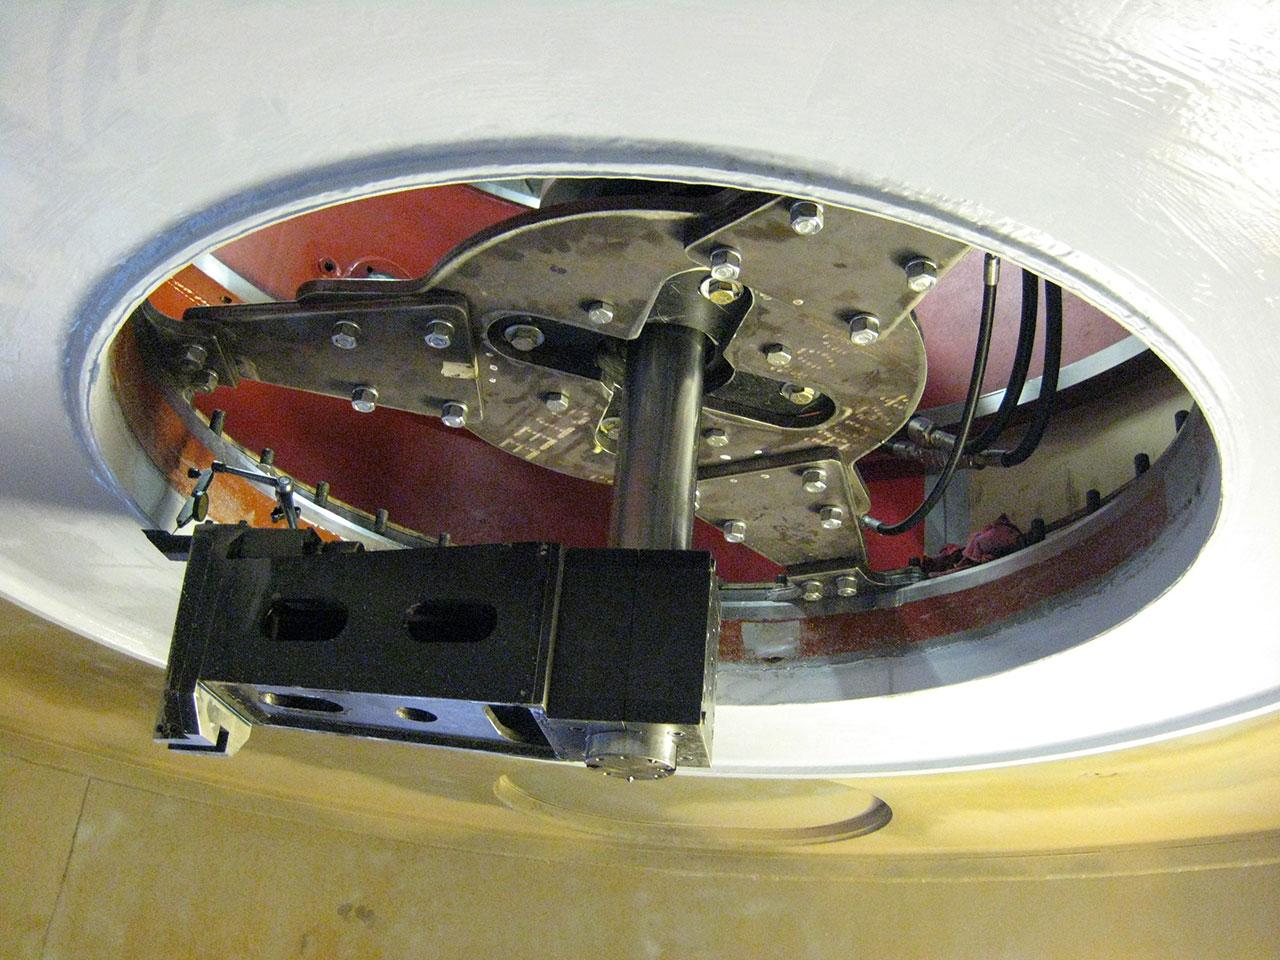 Tuakana - Maching lower seal face on - Tug